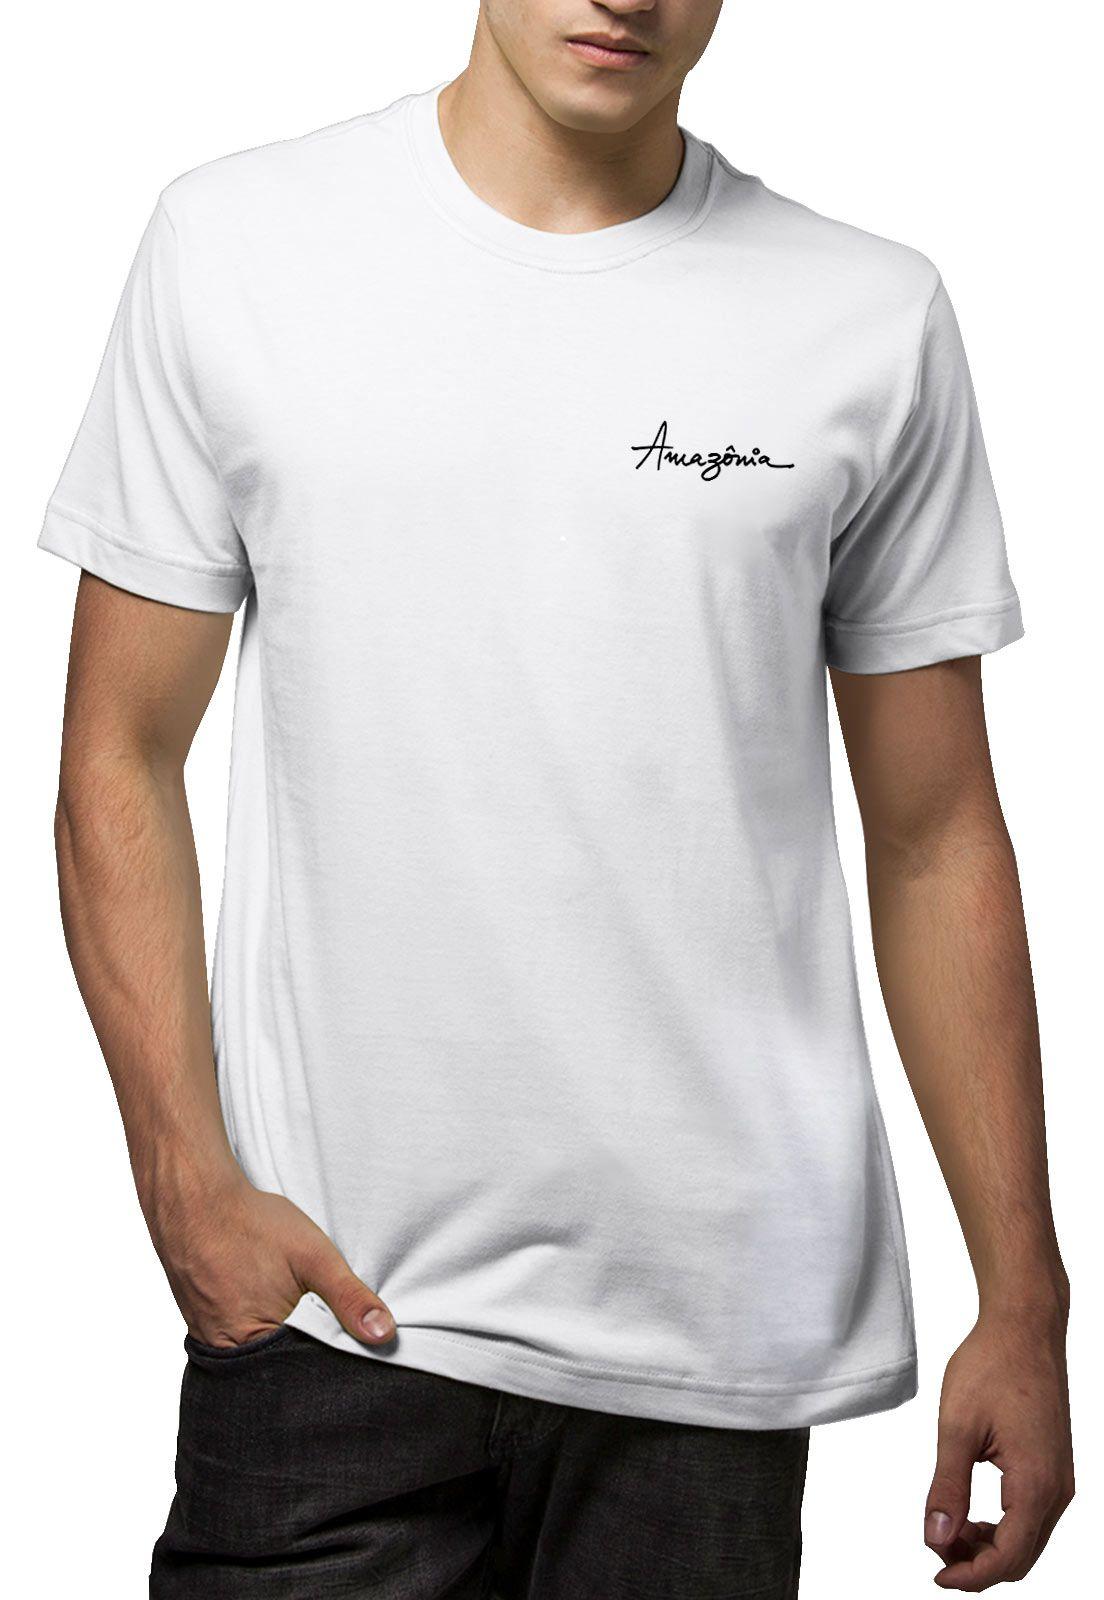 Camiseta Amazônia Tahiti - Branco